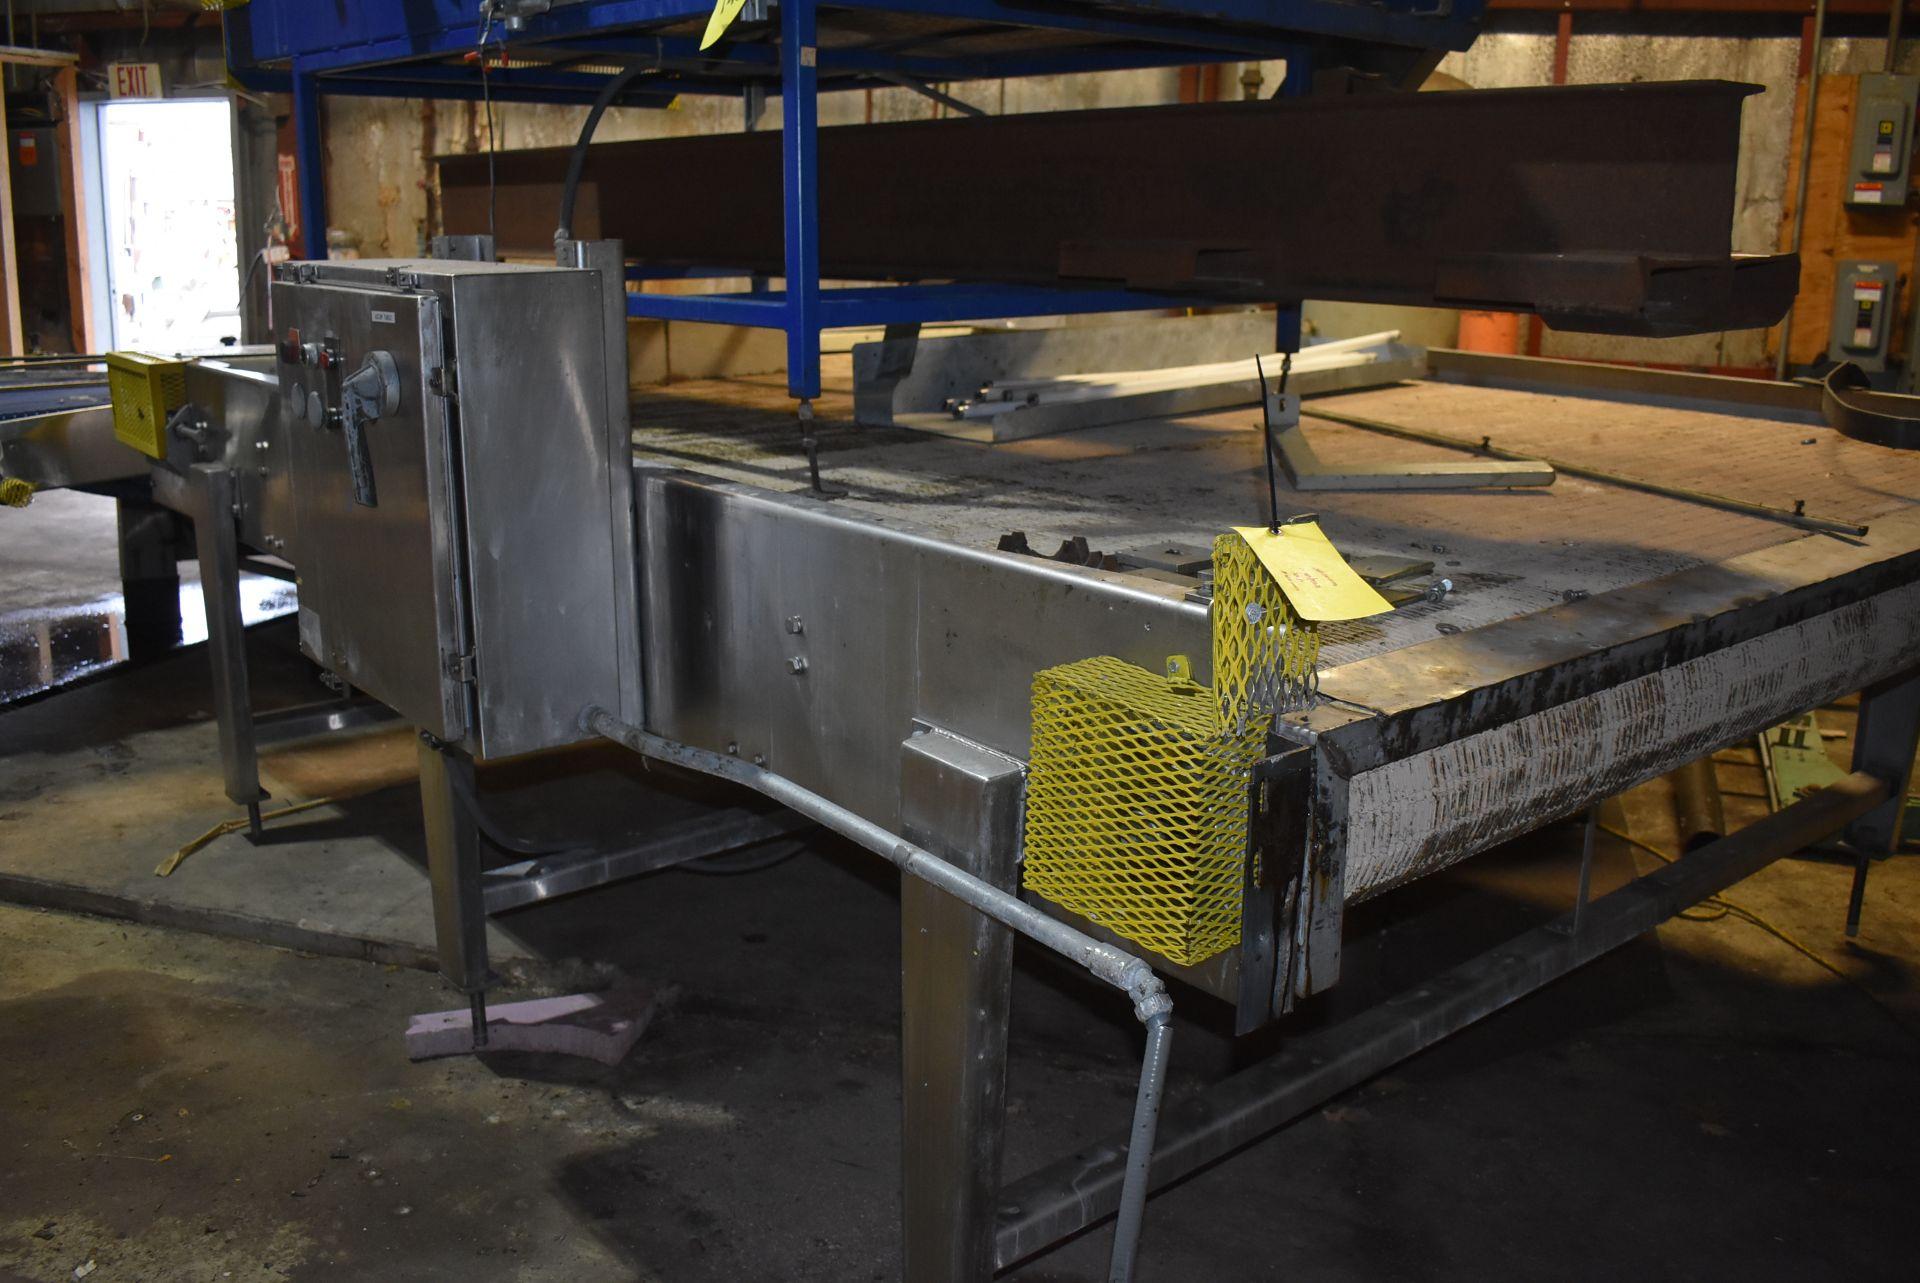 Motorized Belt Conveyor/Accumulation Table, 10' x 8'